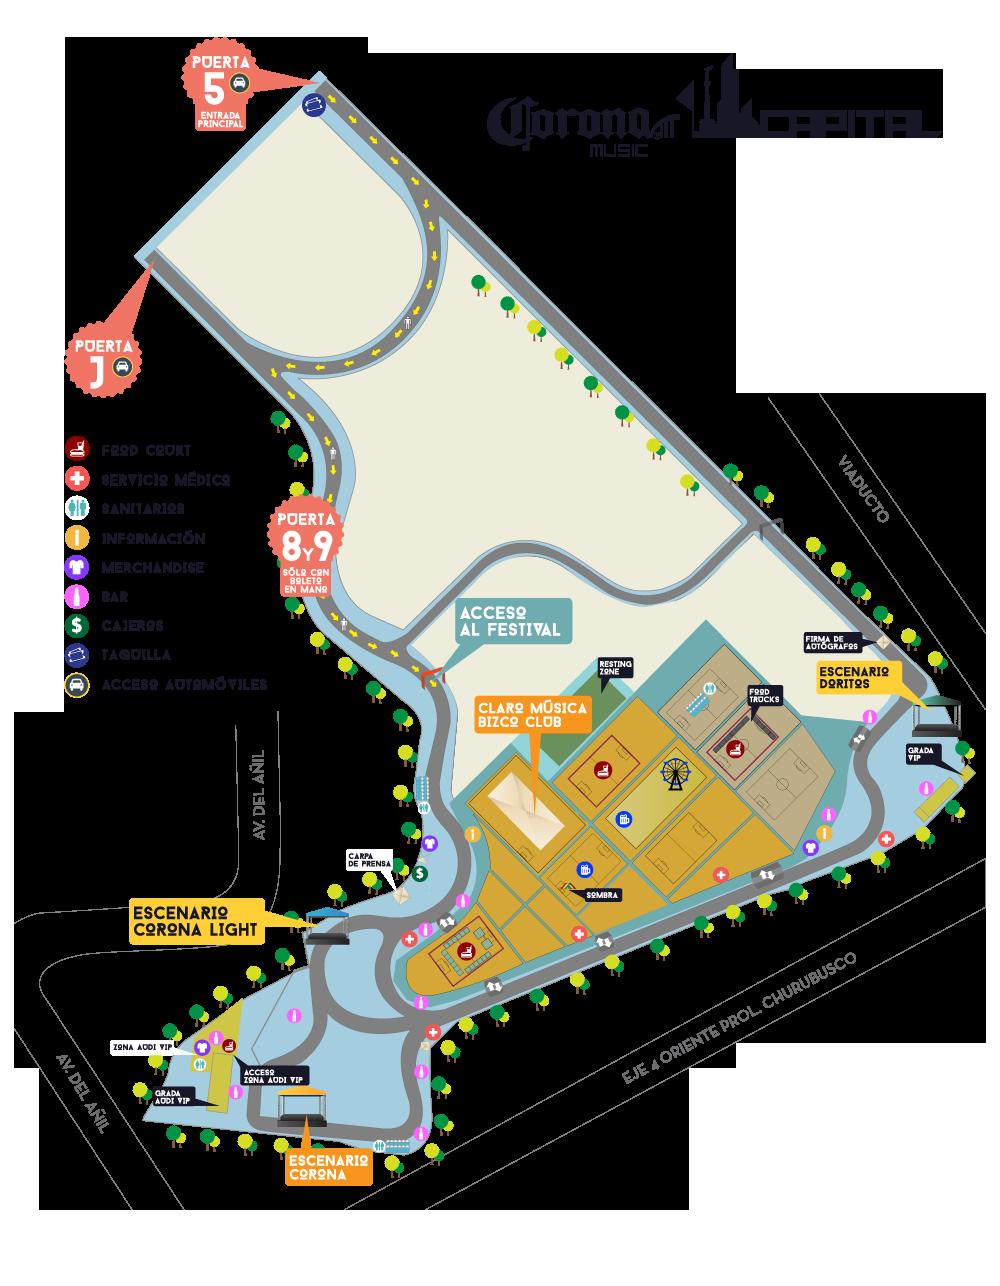 corona capital 2014 mapa